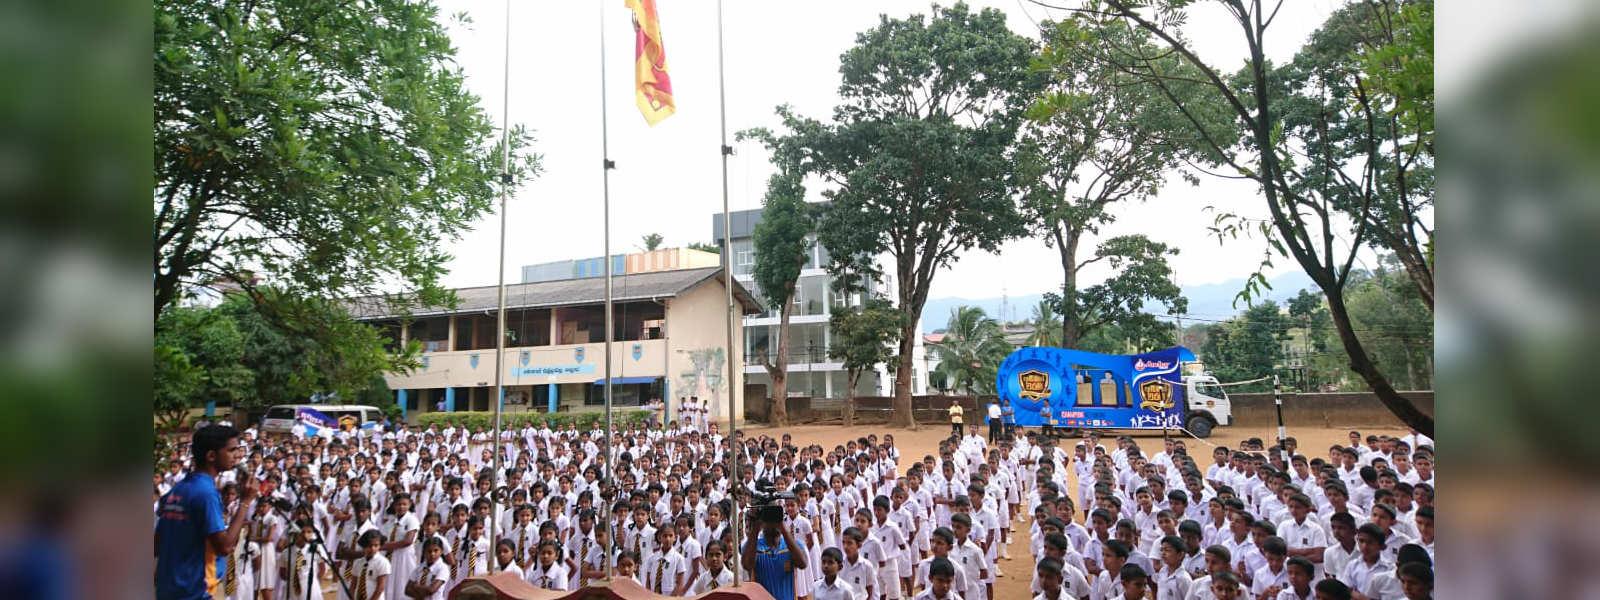 Abhiman-Waram : 10th consecutive day